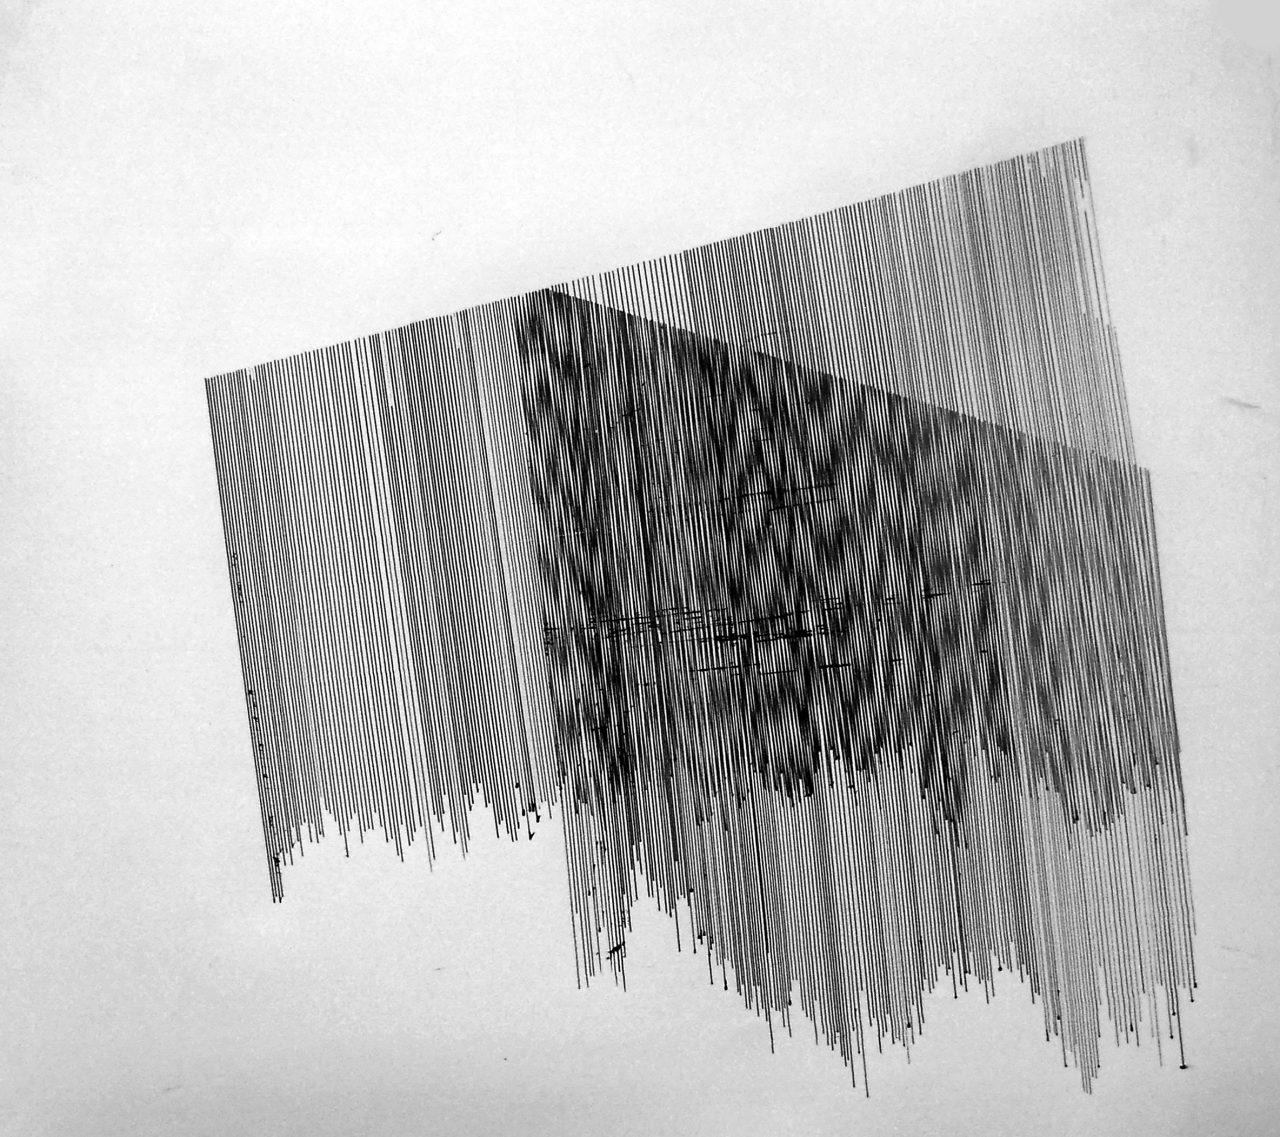 op141, ink on paper,50x50cm